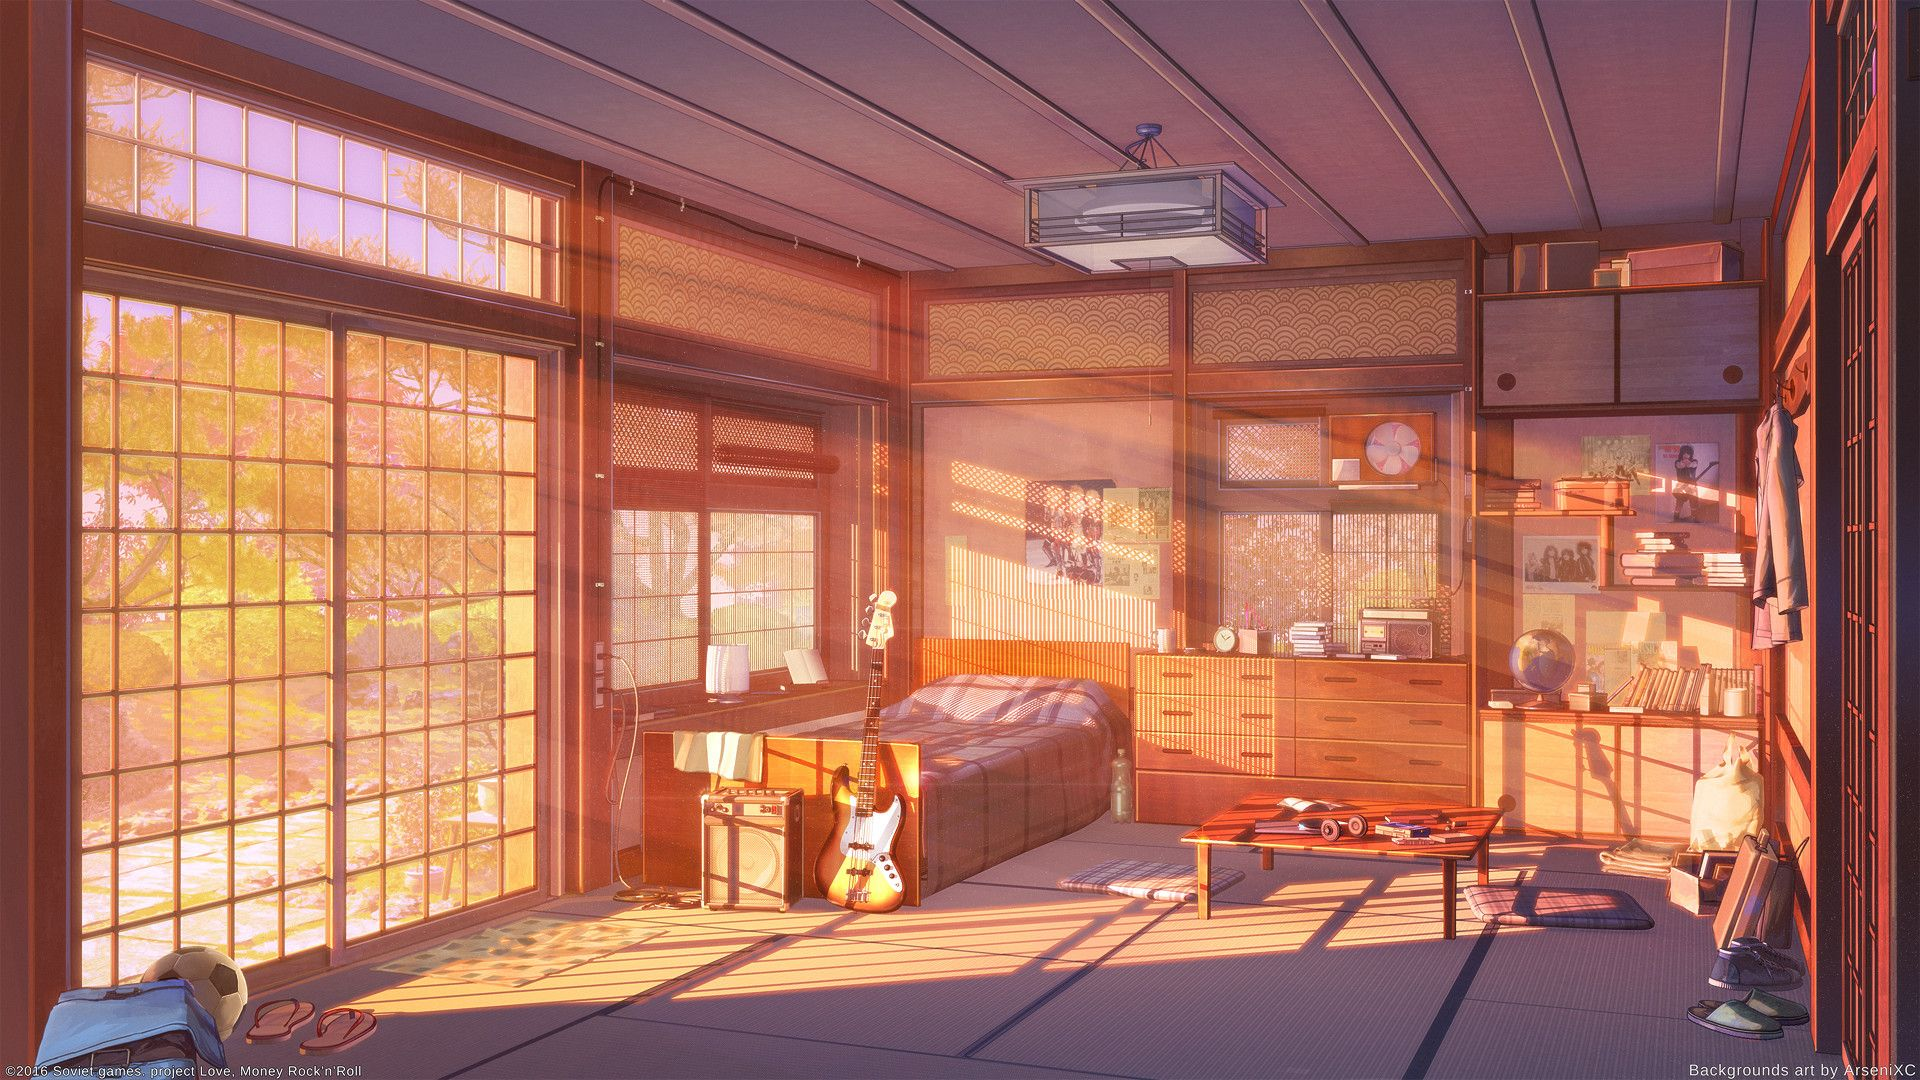 ArtStation Room sunset ver., Arseniy Chebynkin (มีรูปภาพ